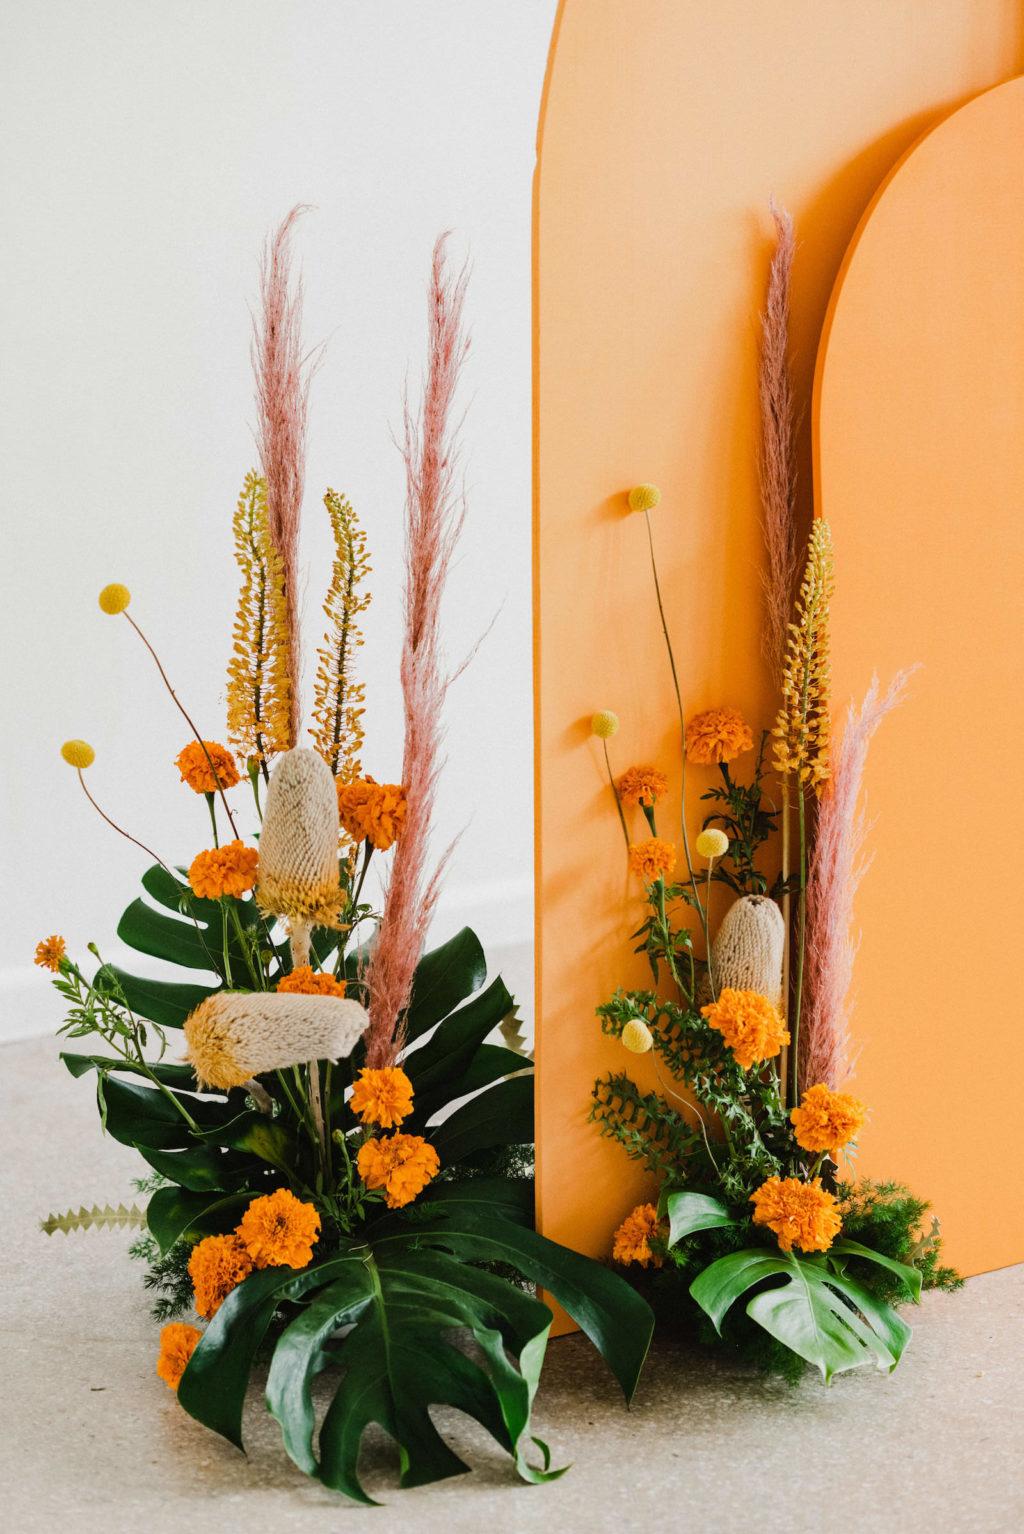 Vibrant Wedding Ceremony Decor, Monstera Palm Leaves, Orange Marigolds, Pampas Grass, and Yellow Flower Arrangements